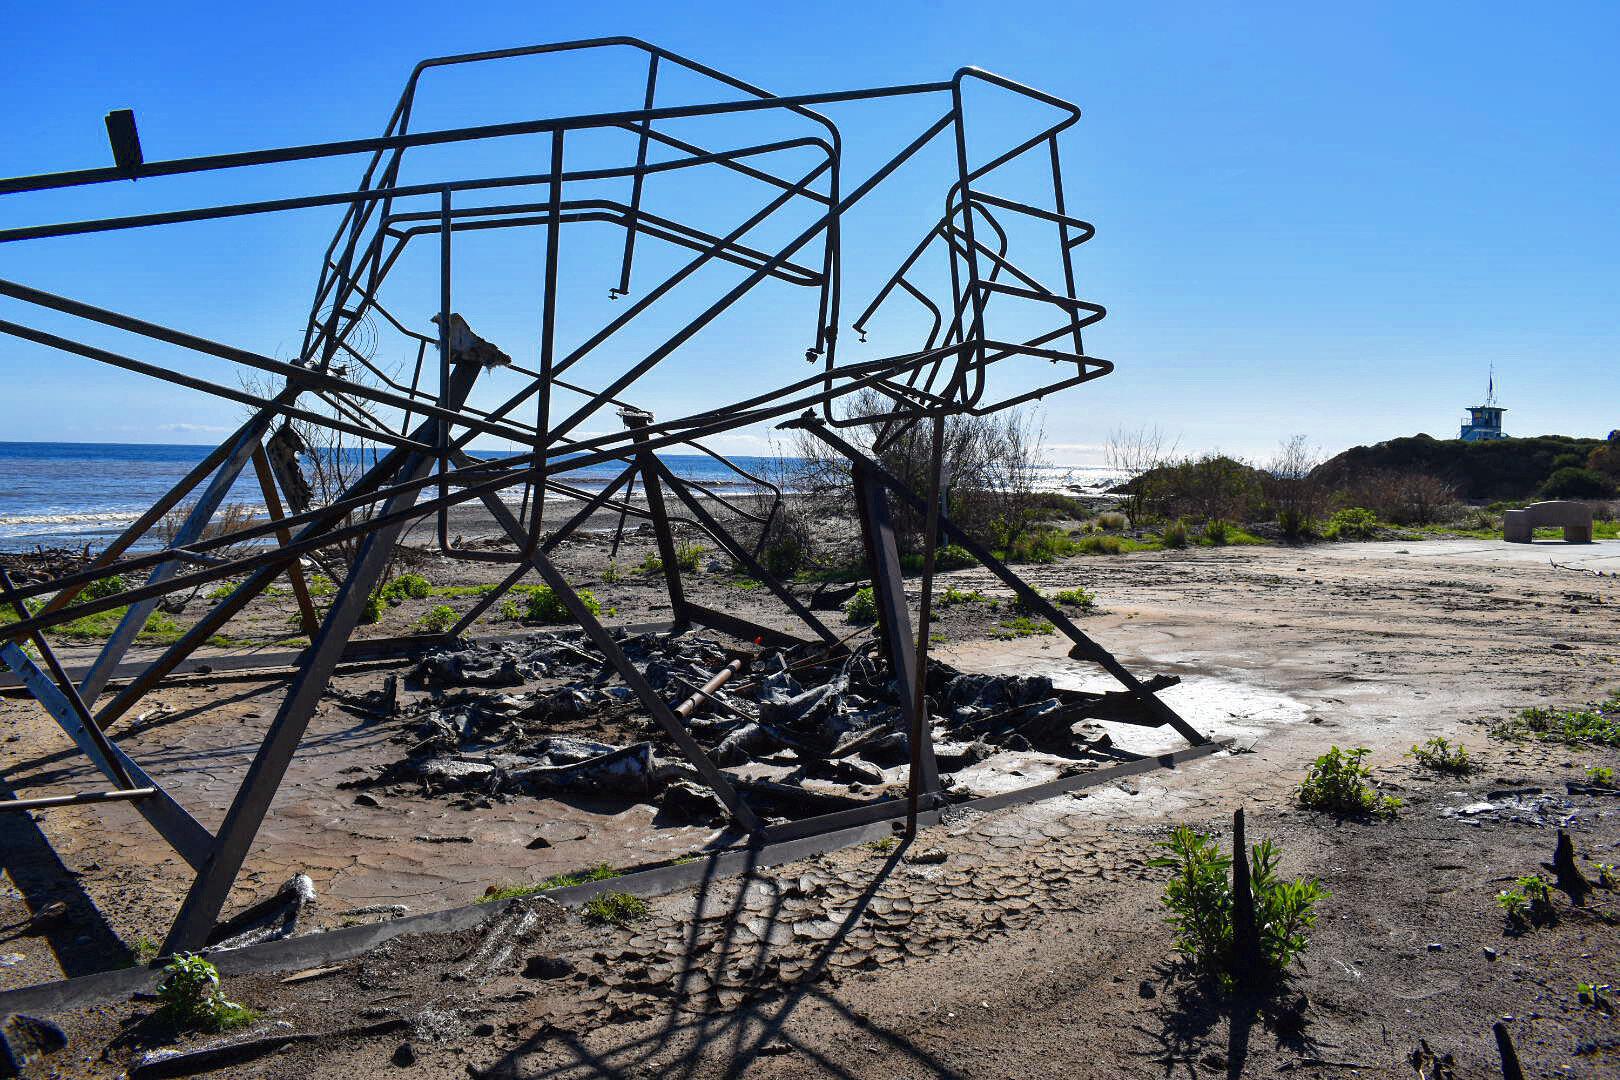 Feruary 2019 - Leo Carillo State Beach - skeleton of a burned lifeguard tower still sitting on the shore (📷: Lisa Butala Zabaldo)